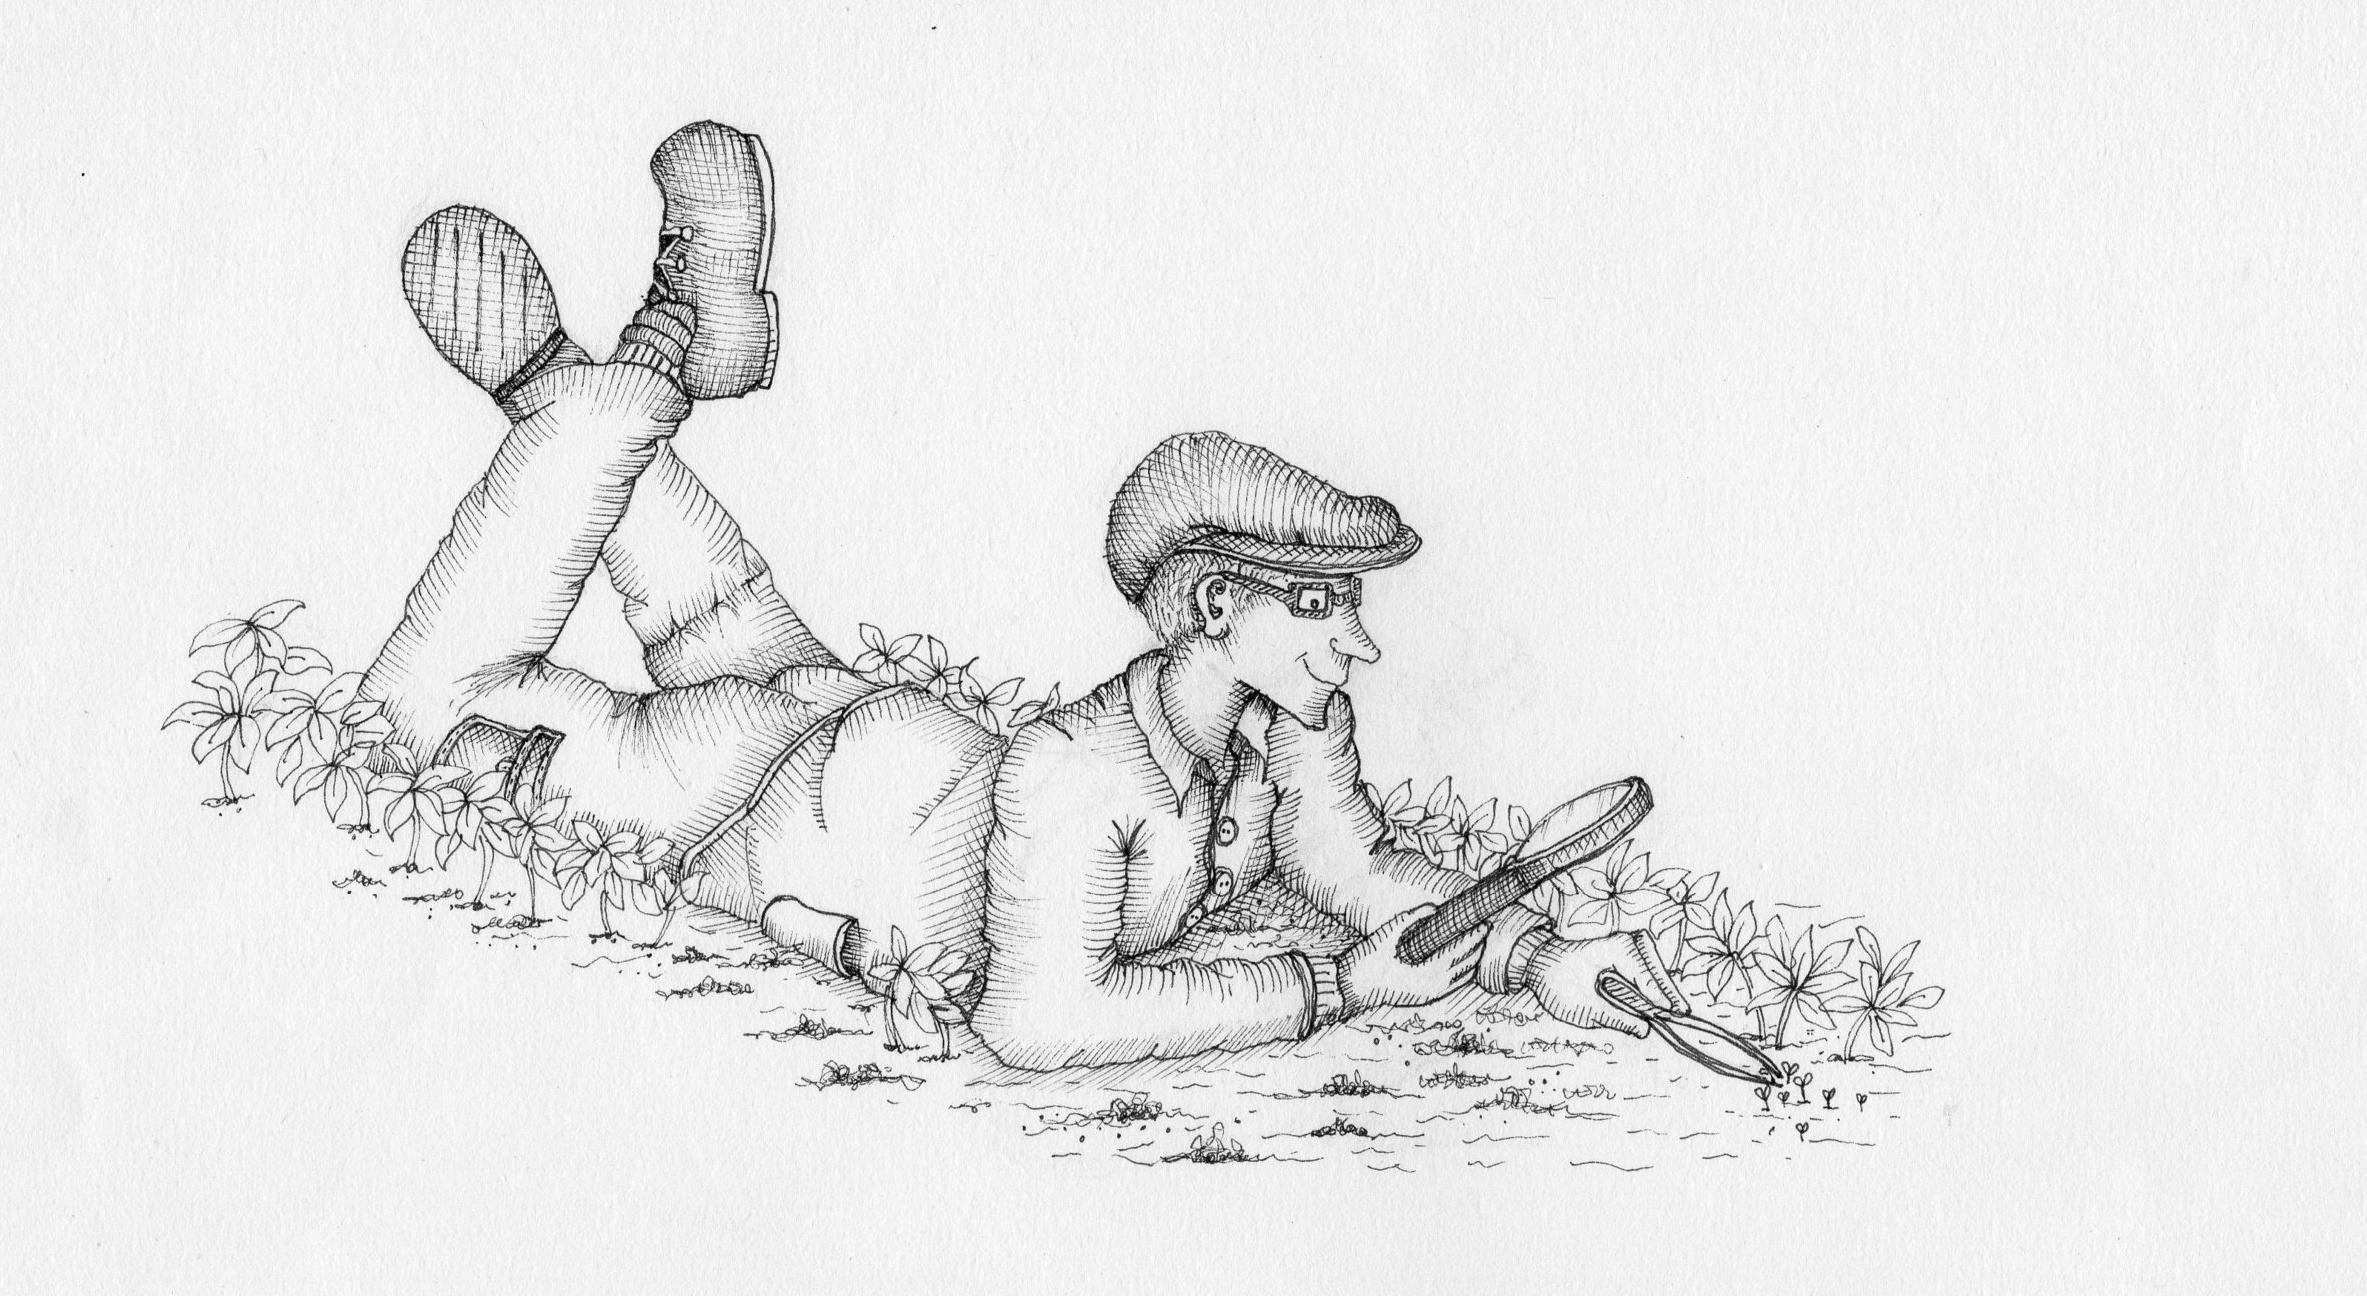 Just a little micro-weeding, dear!